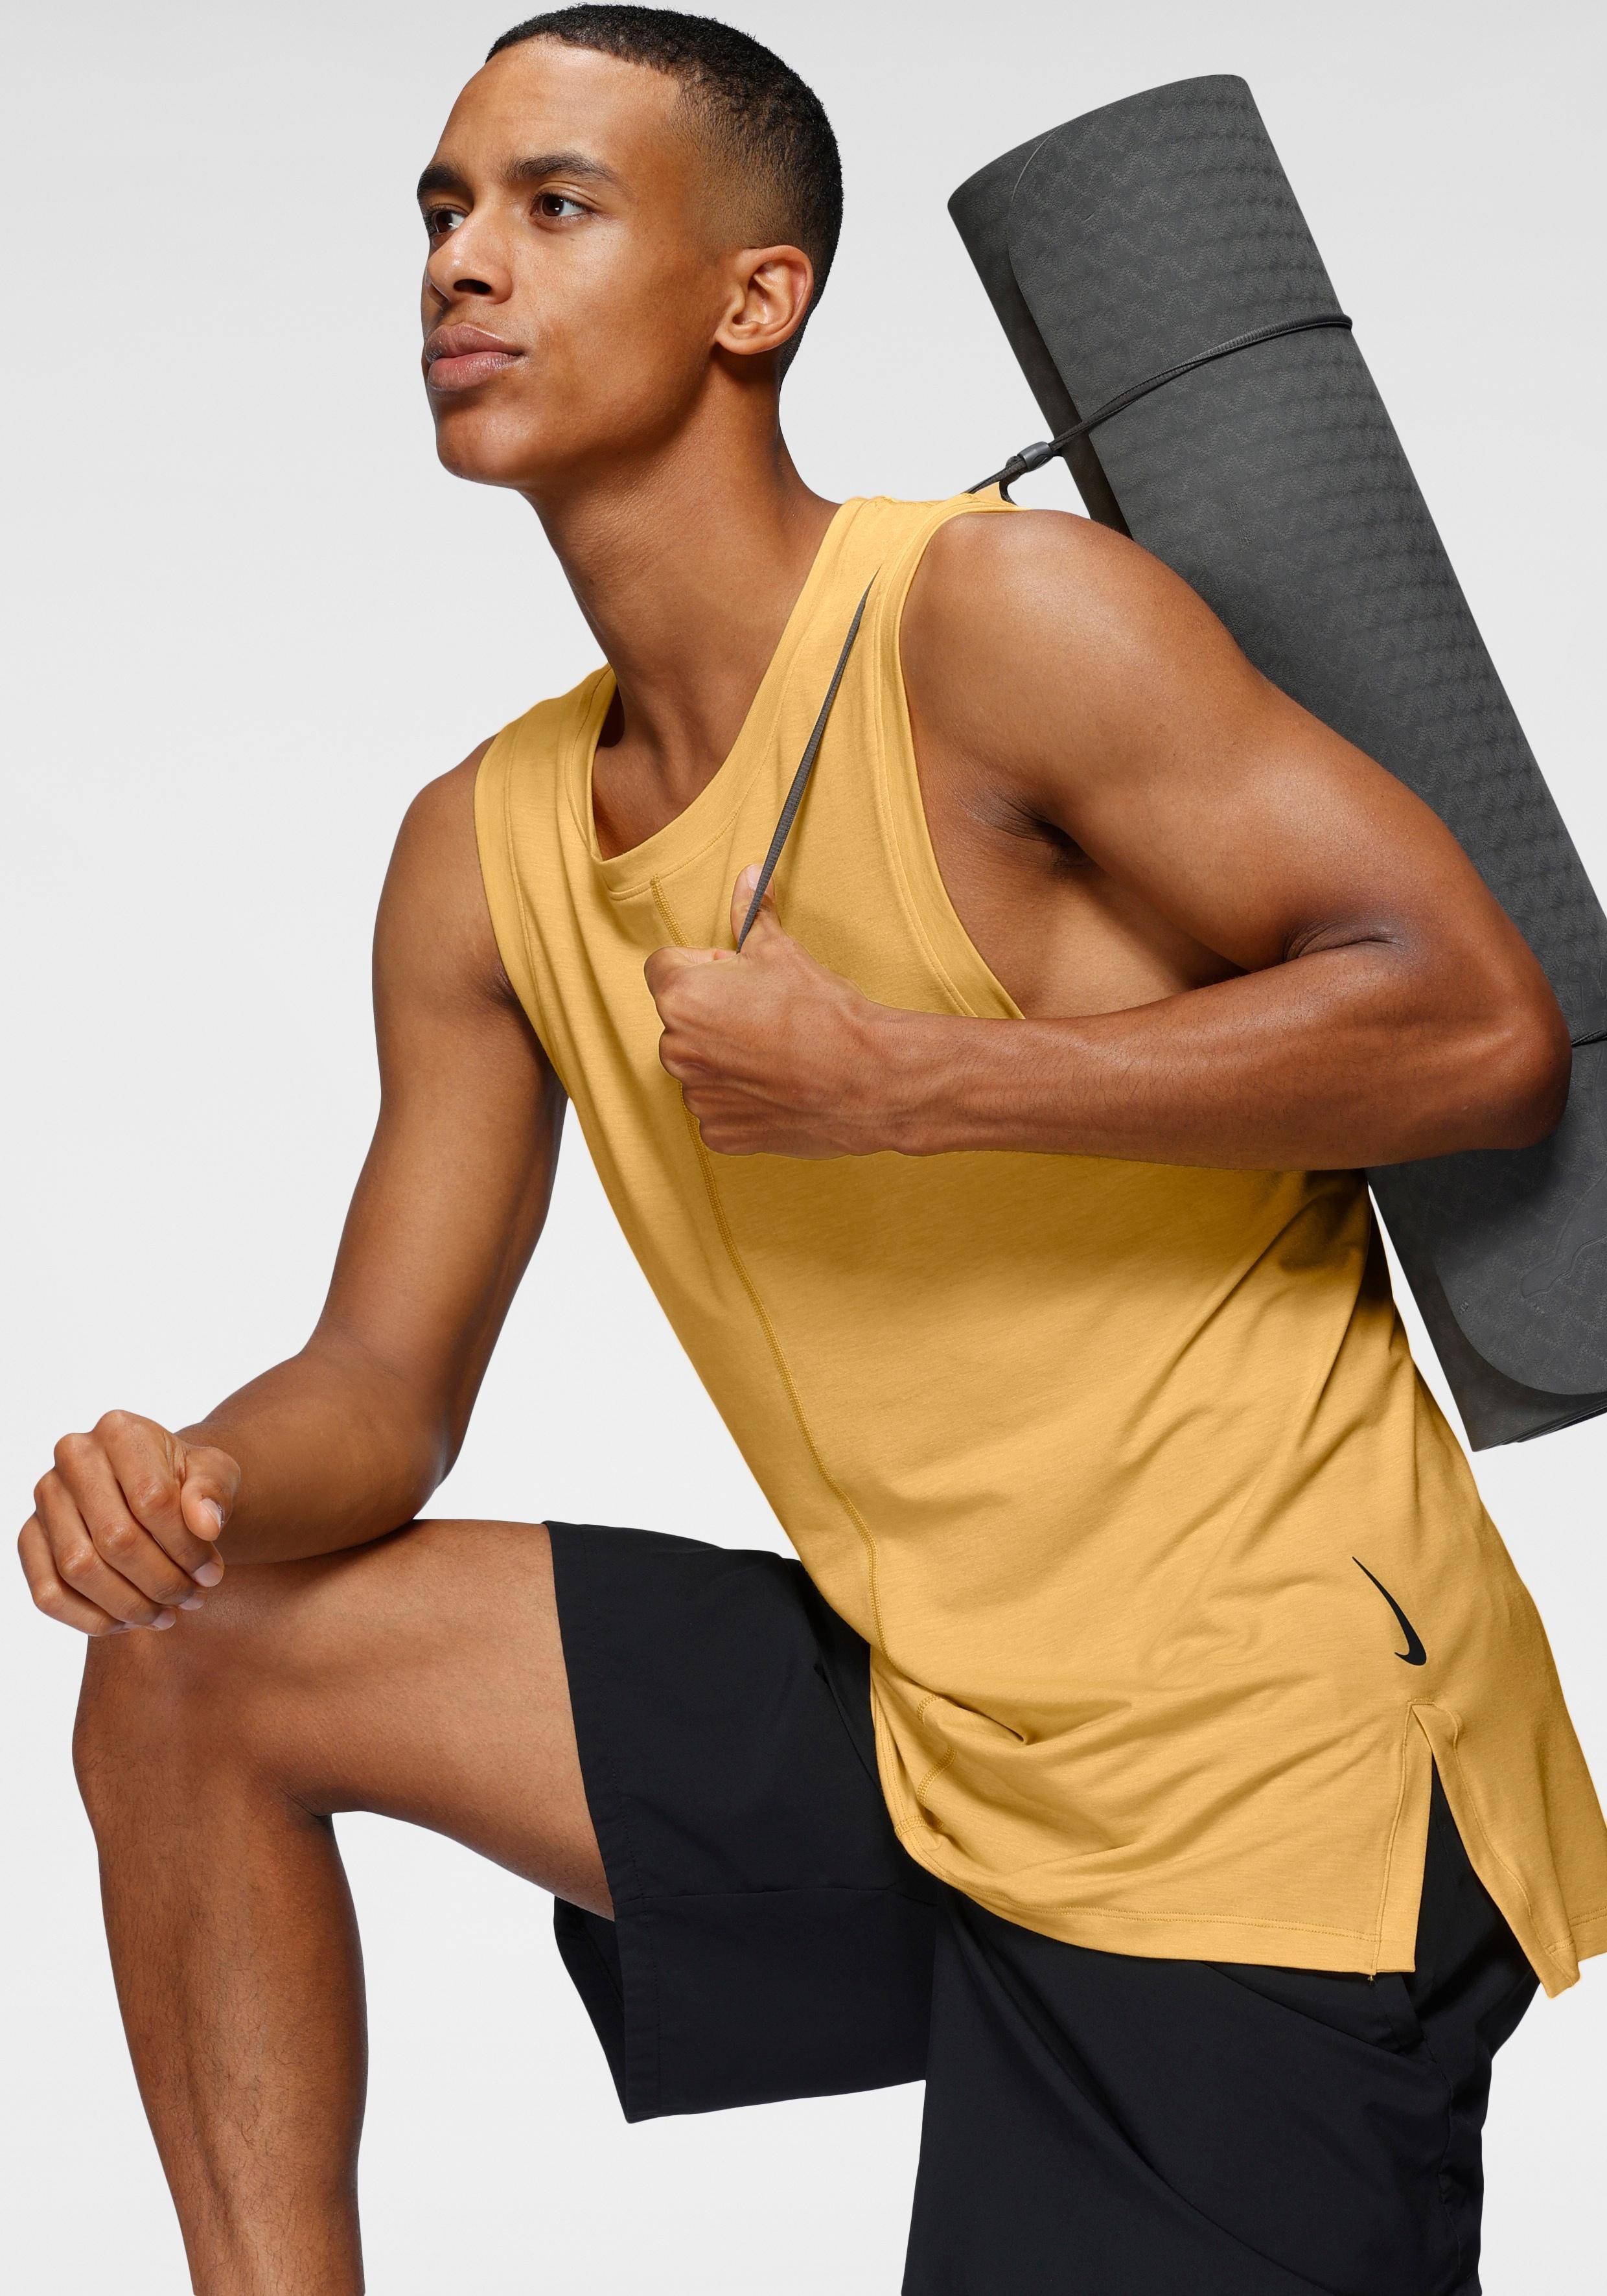 Nike Yogatop Dri-FIT Men's Yoga Training Tank gelb Herren Tops Shirts